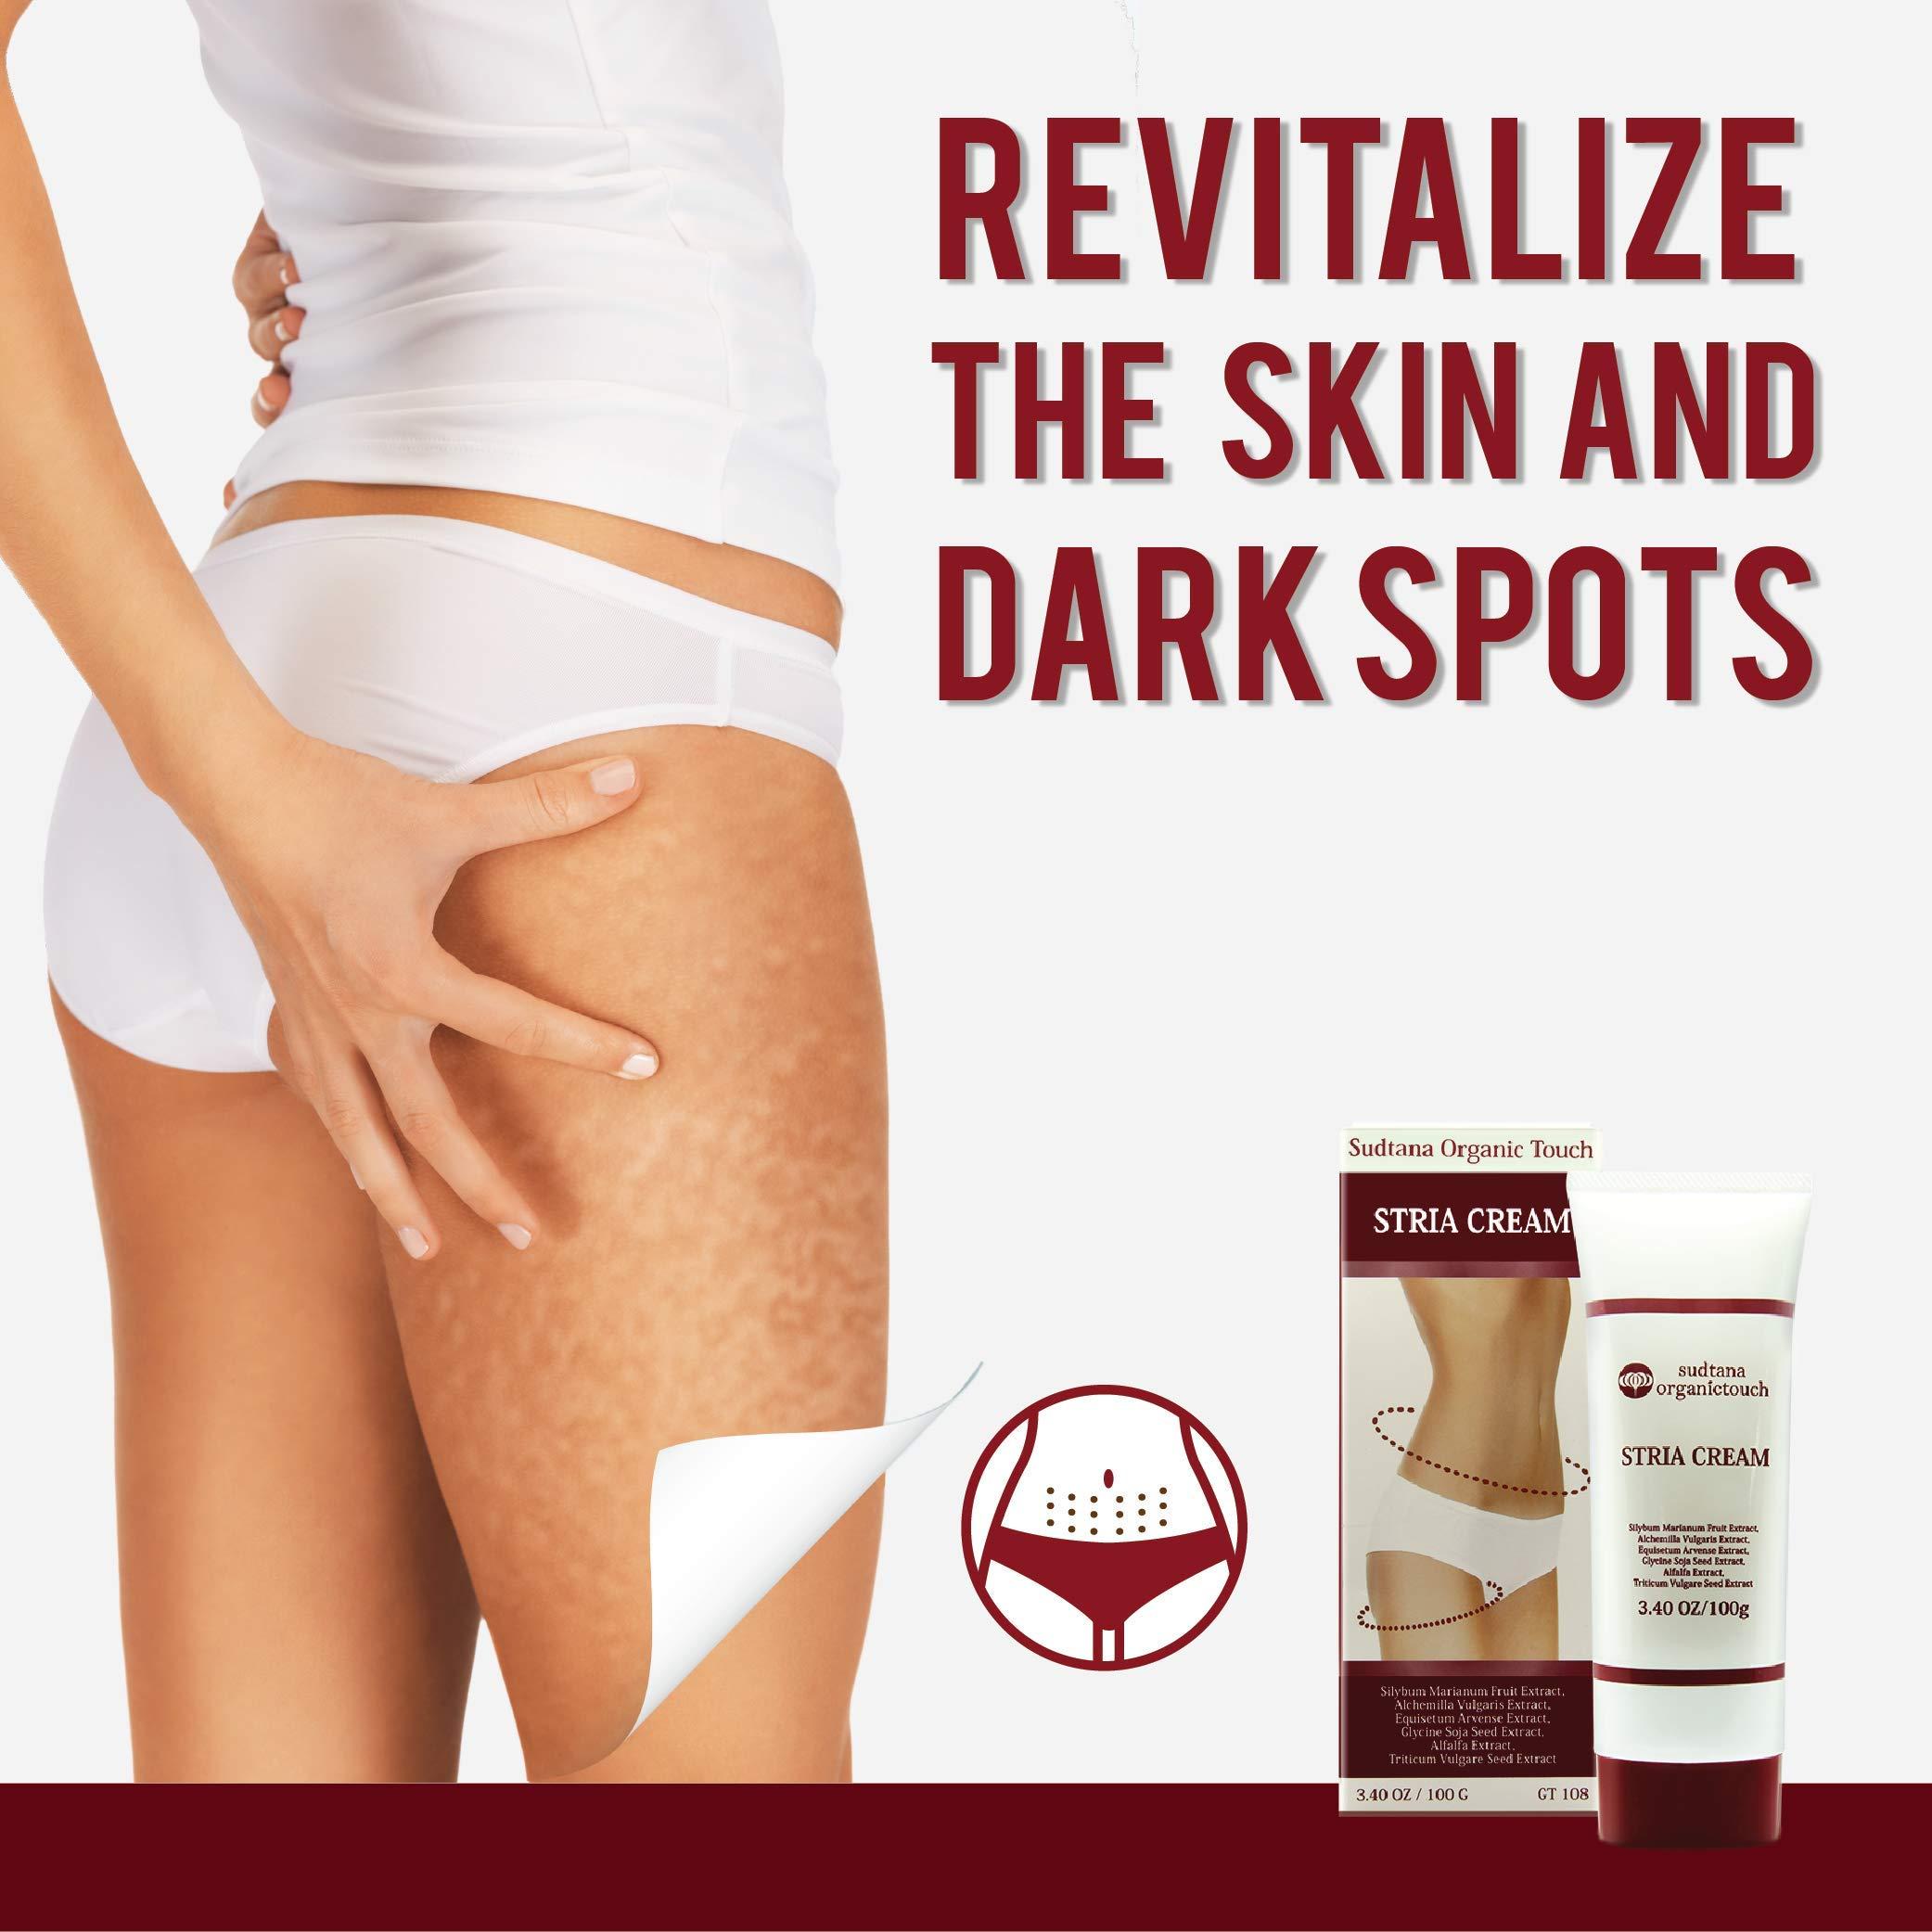 STRIA Natural Stretch Marks, Scar & Dark Spot Remover   Stretch Mark Cream for Skin Hydration, Exfoliation, Tightening & Collagen Boost   Pregnancy Belly Care for Prenatal-Postnatal & Pregnant   3 pcs by GreenTouch (Image #5)